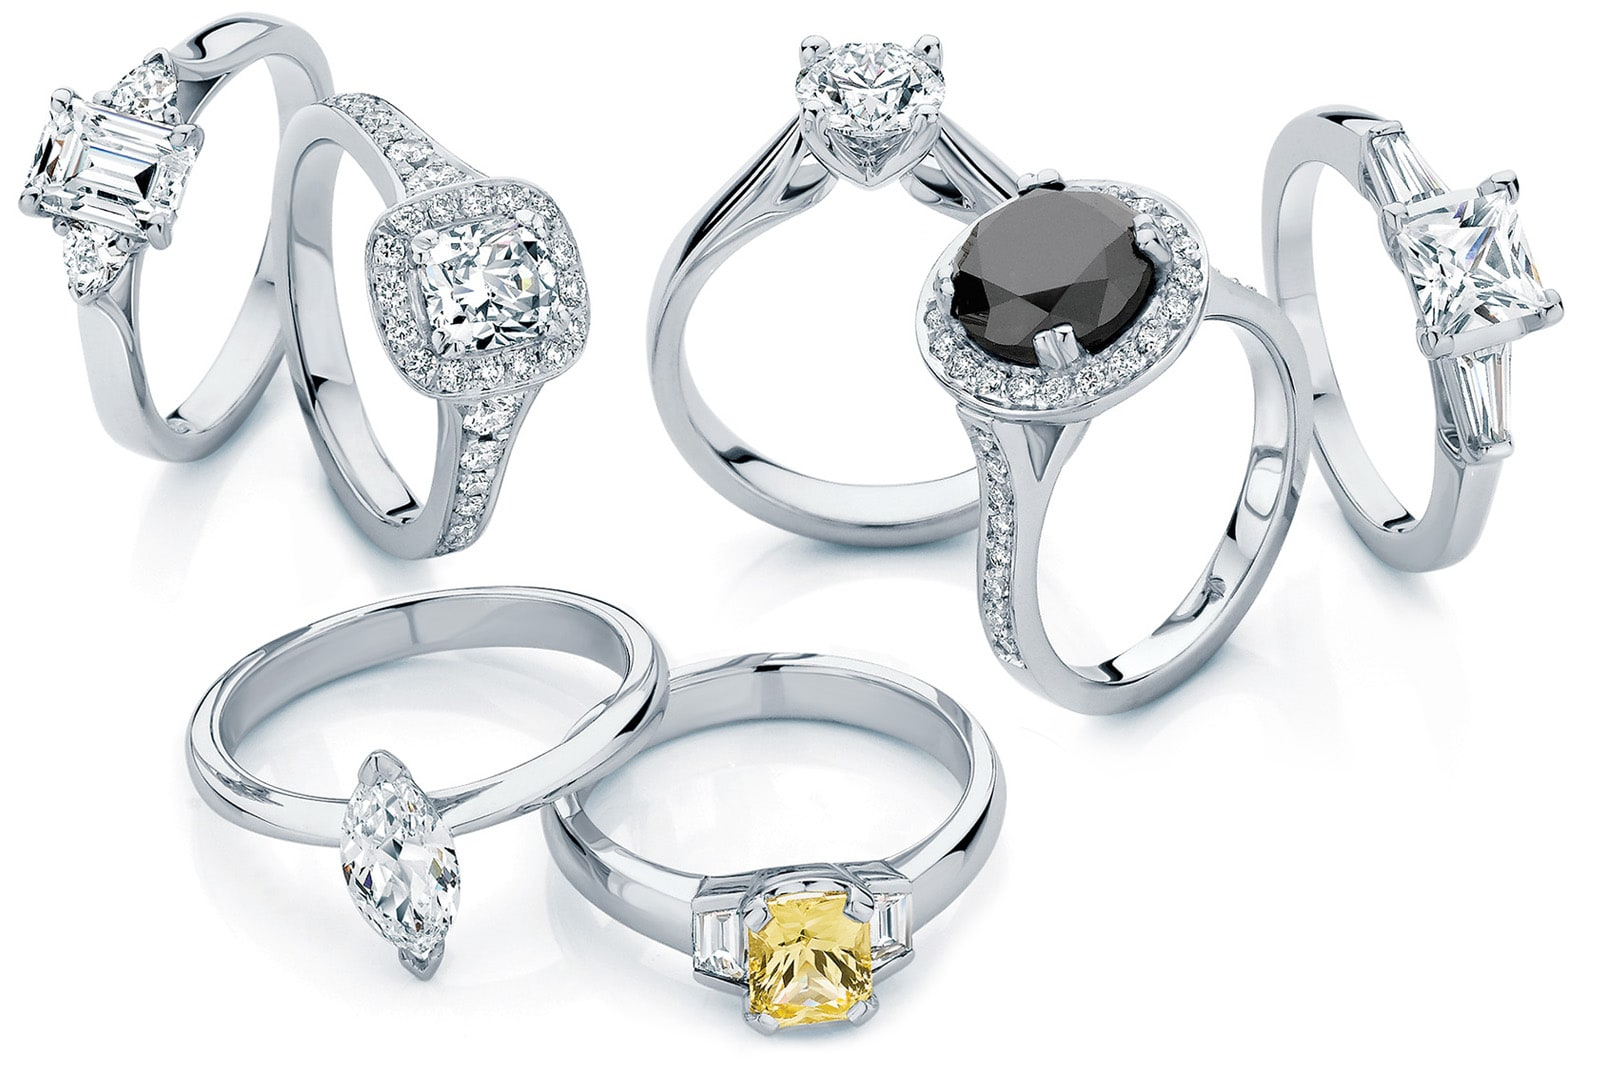 larsen-jewellery-diamond-rings-1